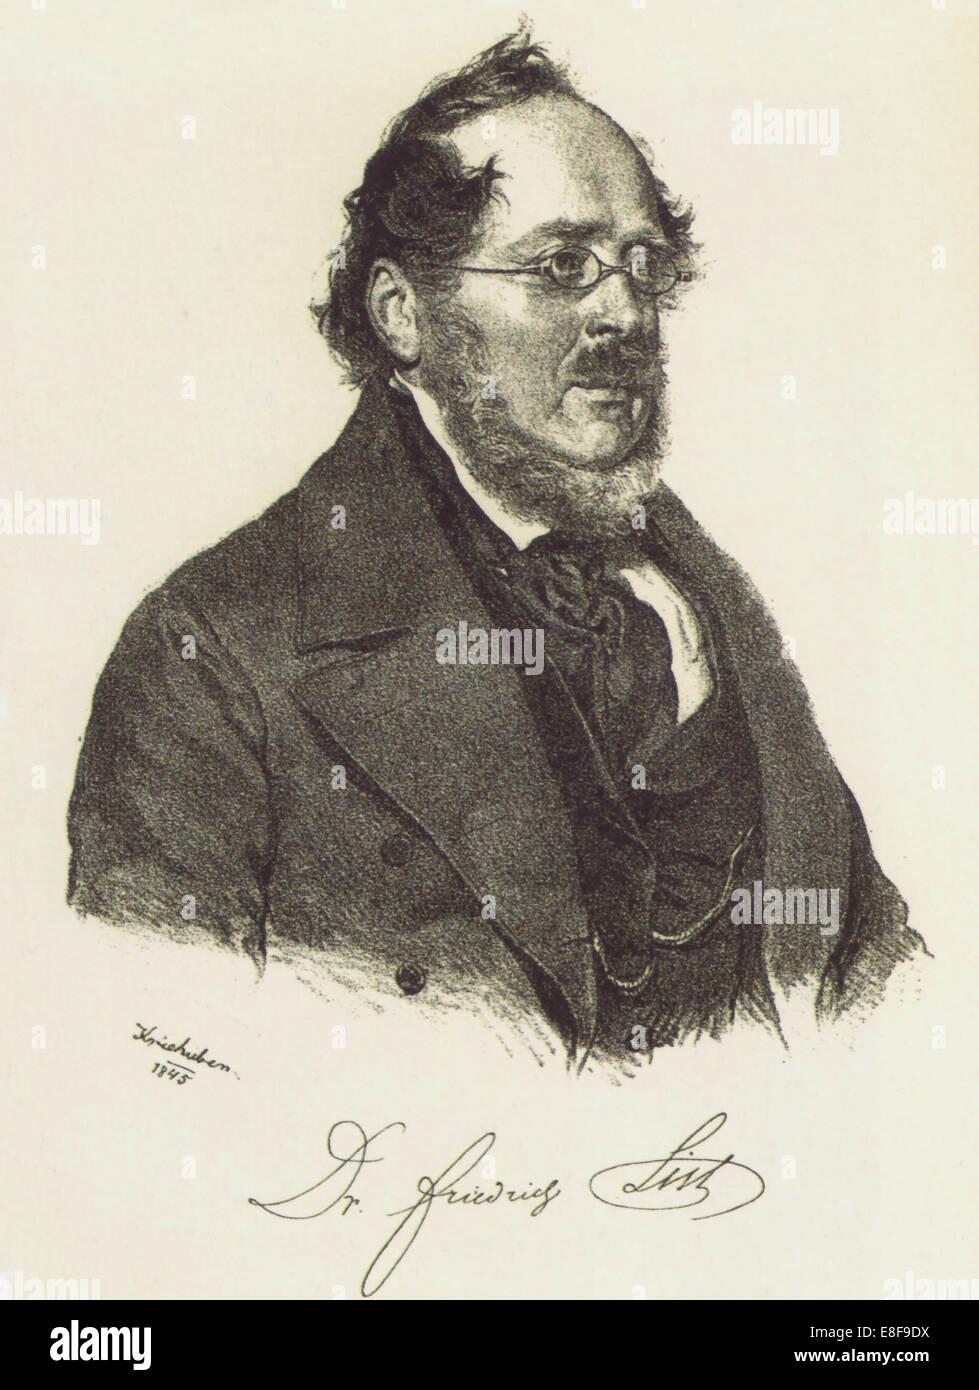 Friedrich List (1789-1846). Artist: Kriehuber, Josef (1800-1876) - Stock Image